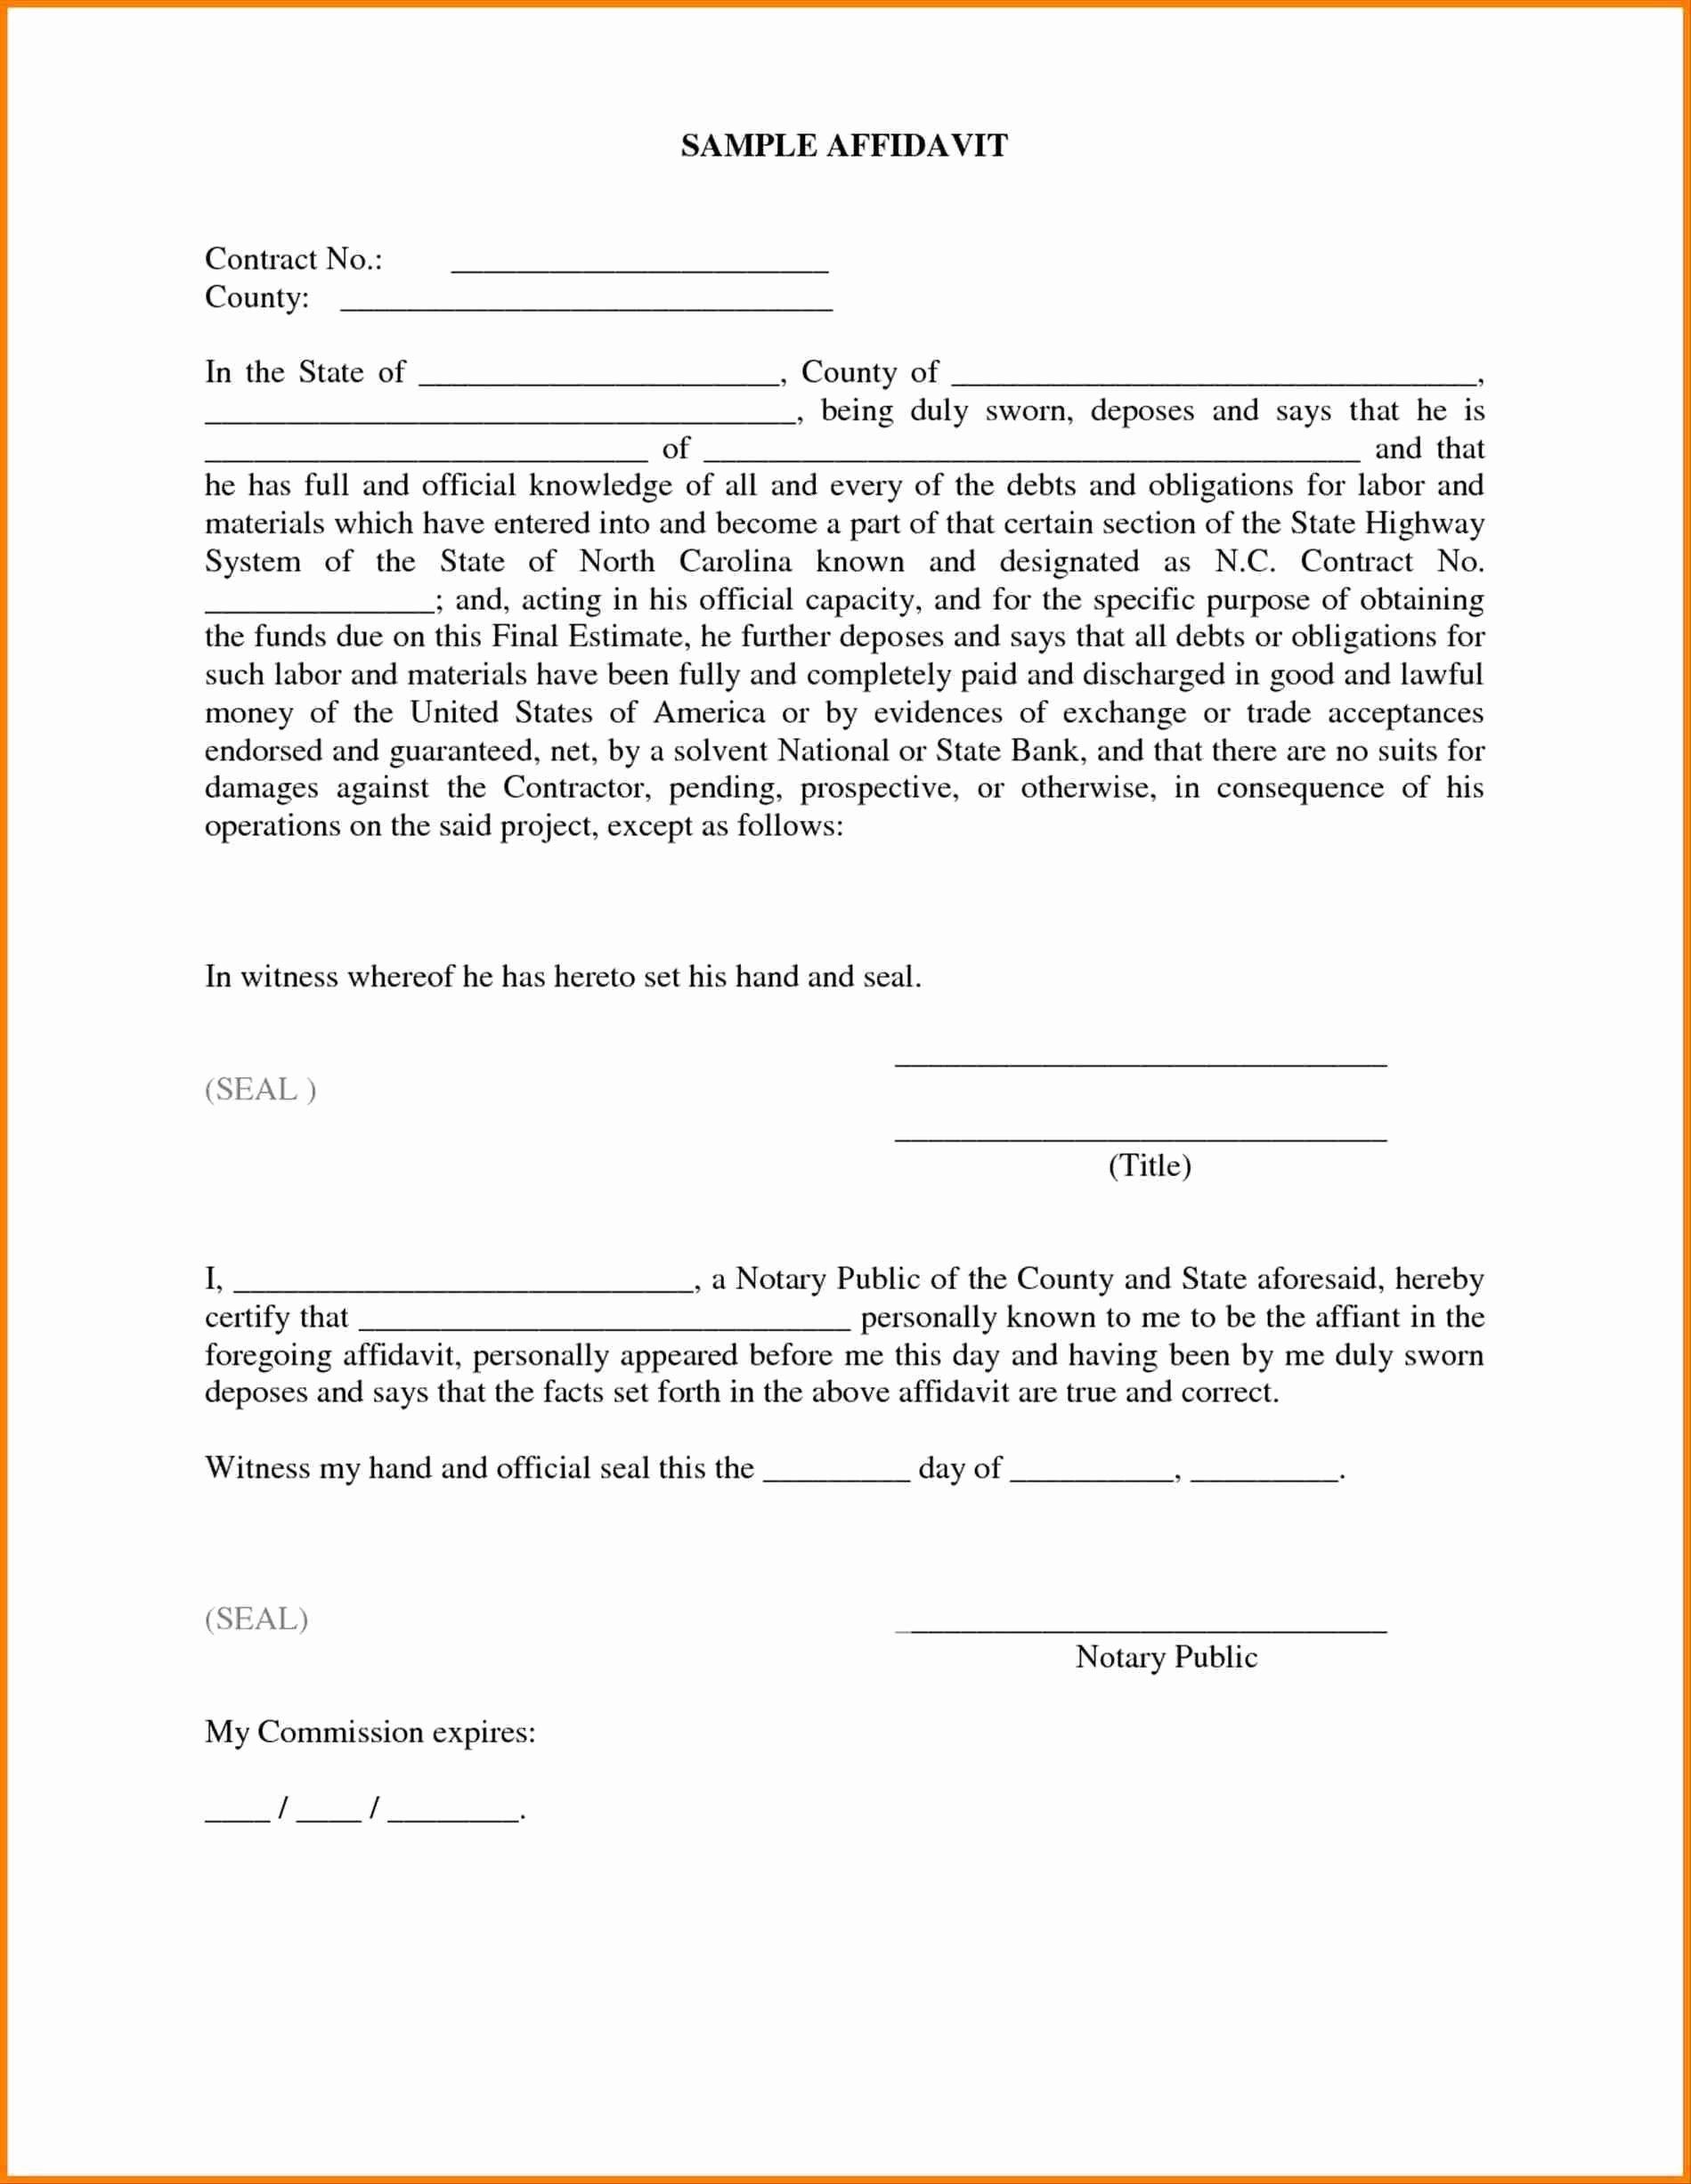 Affidavit Of Support Template Awesome Affidavit Template